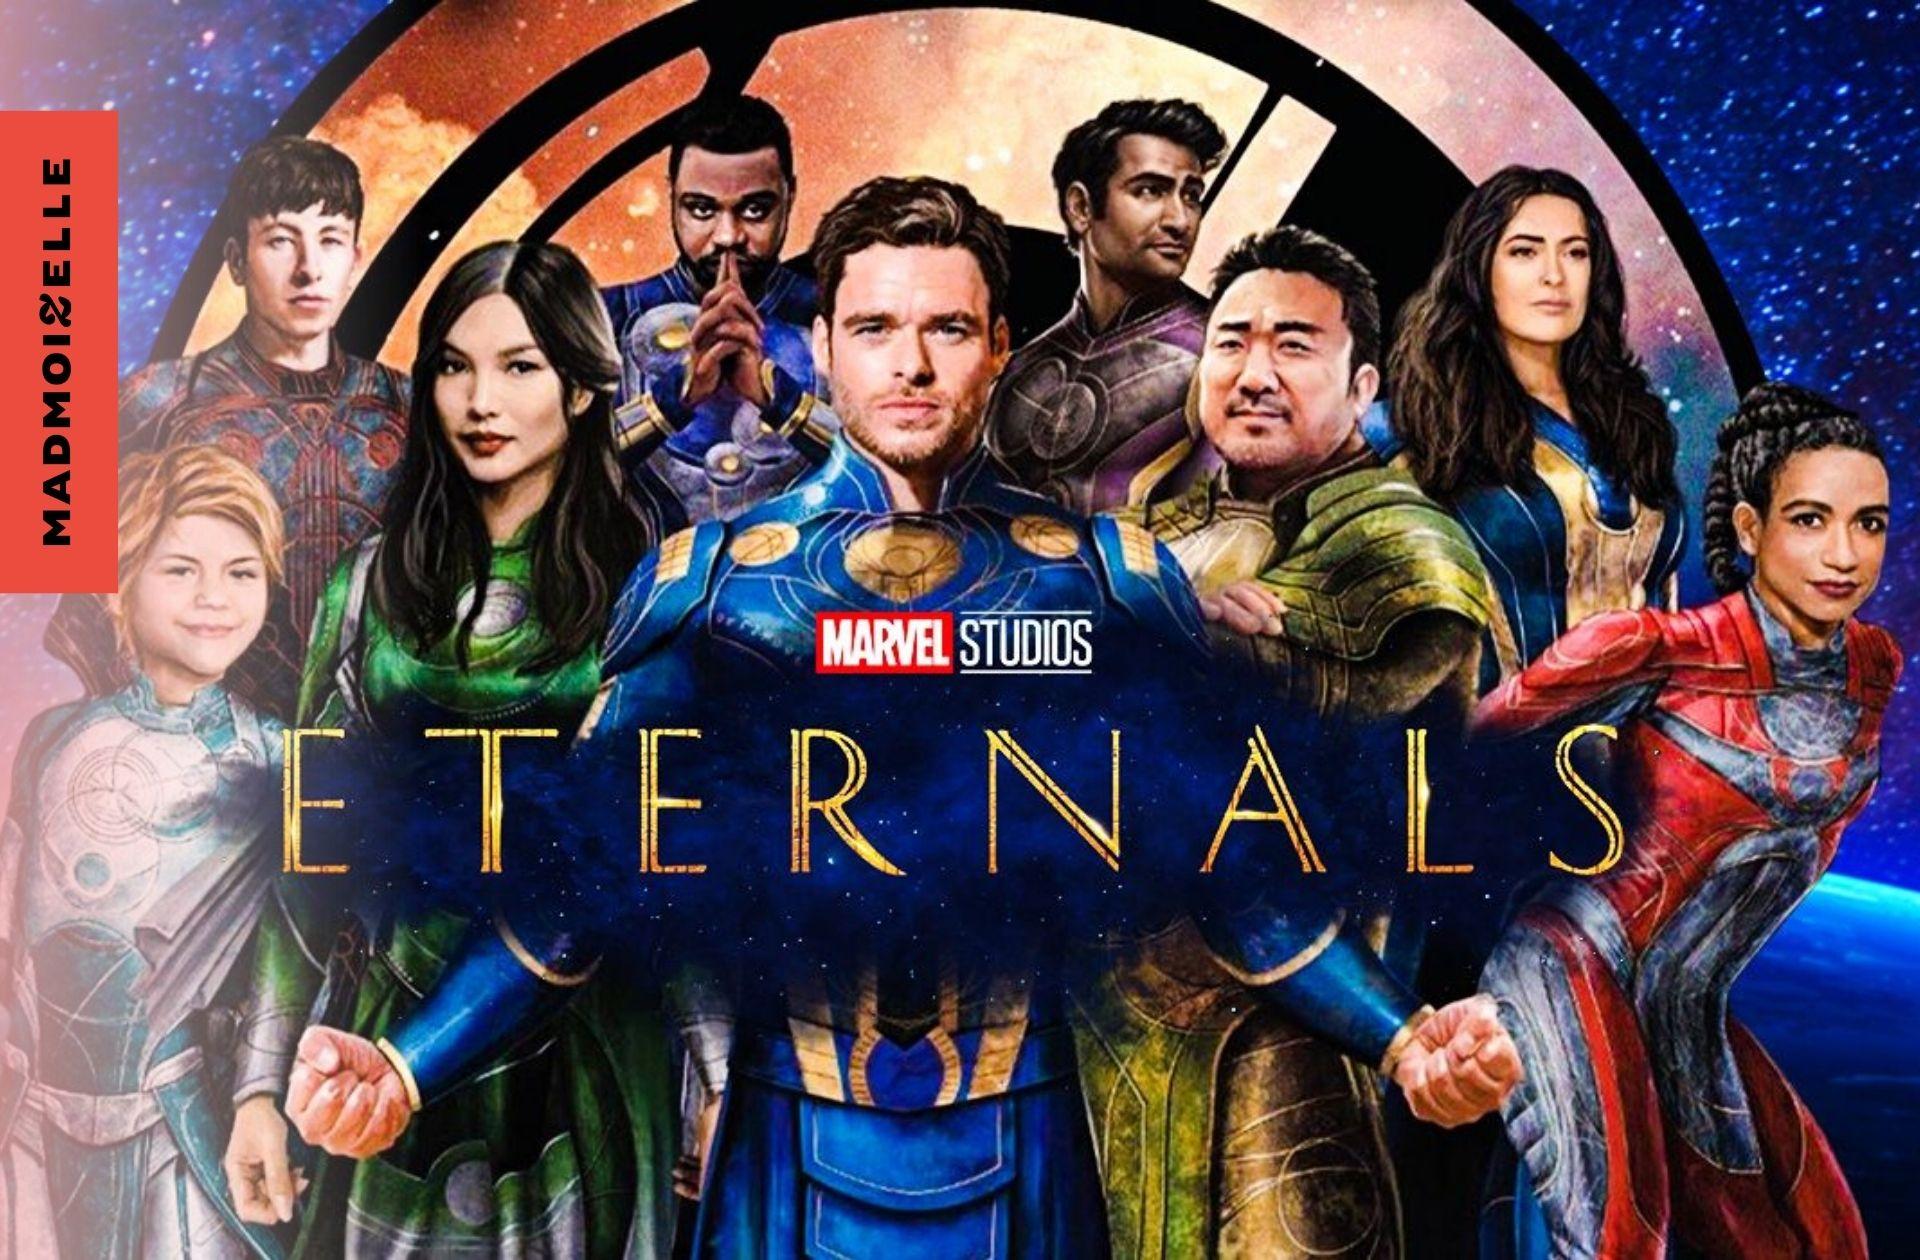 « Les Éternels » invite chez Marvel Angelina Jolie, Kit Harington, Chloe Zhao, Richard Madden…